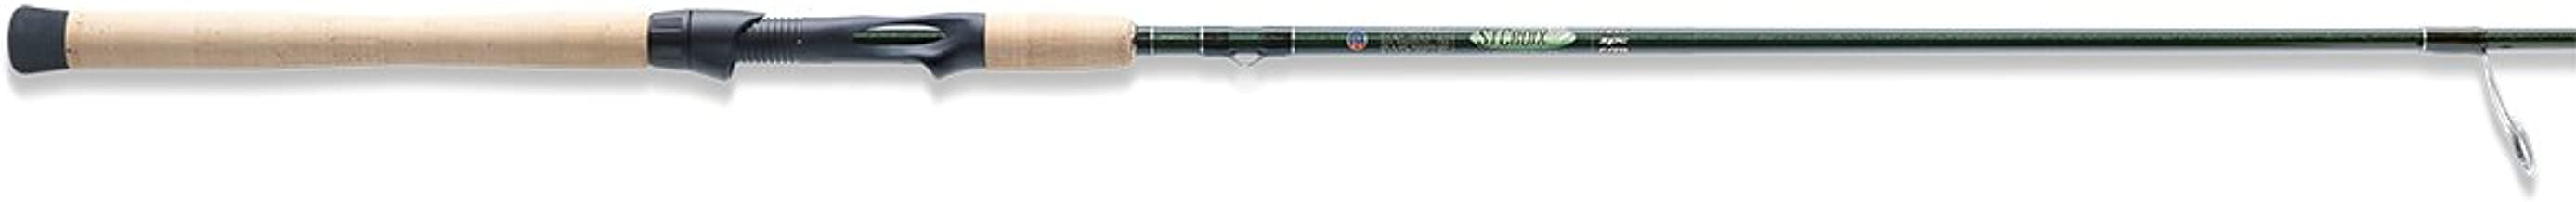 St. Croix Legend Elite Salmon & Steelhead Spinning Rods